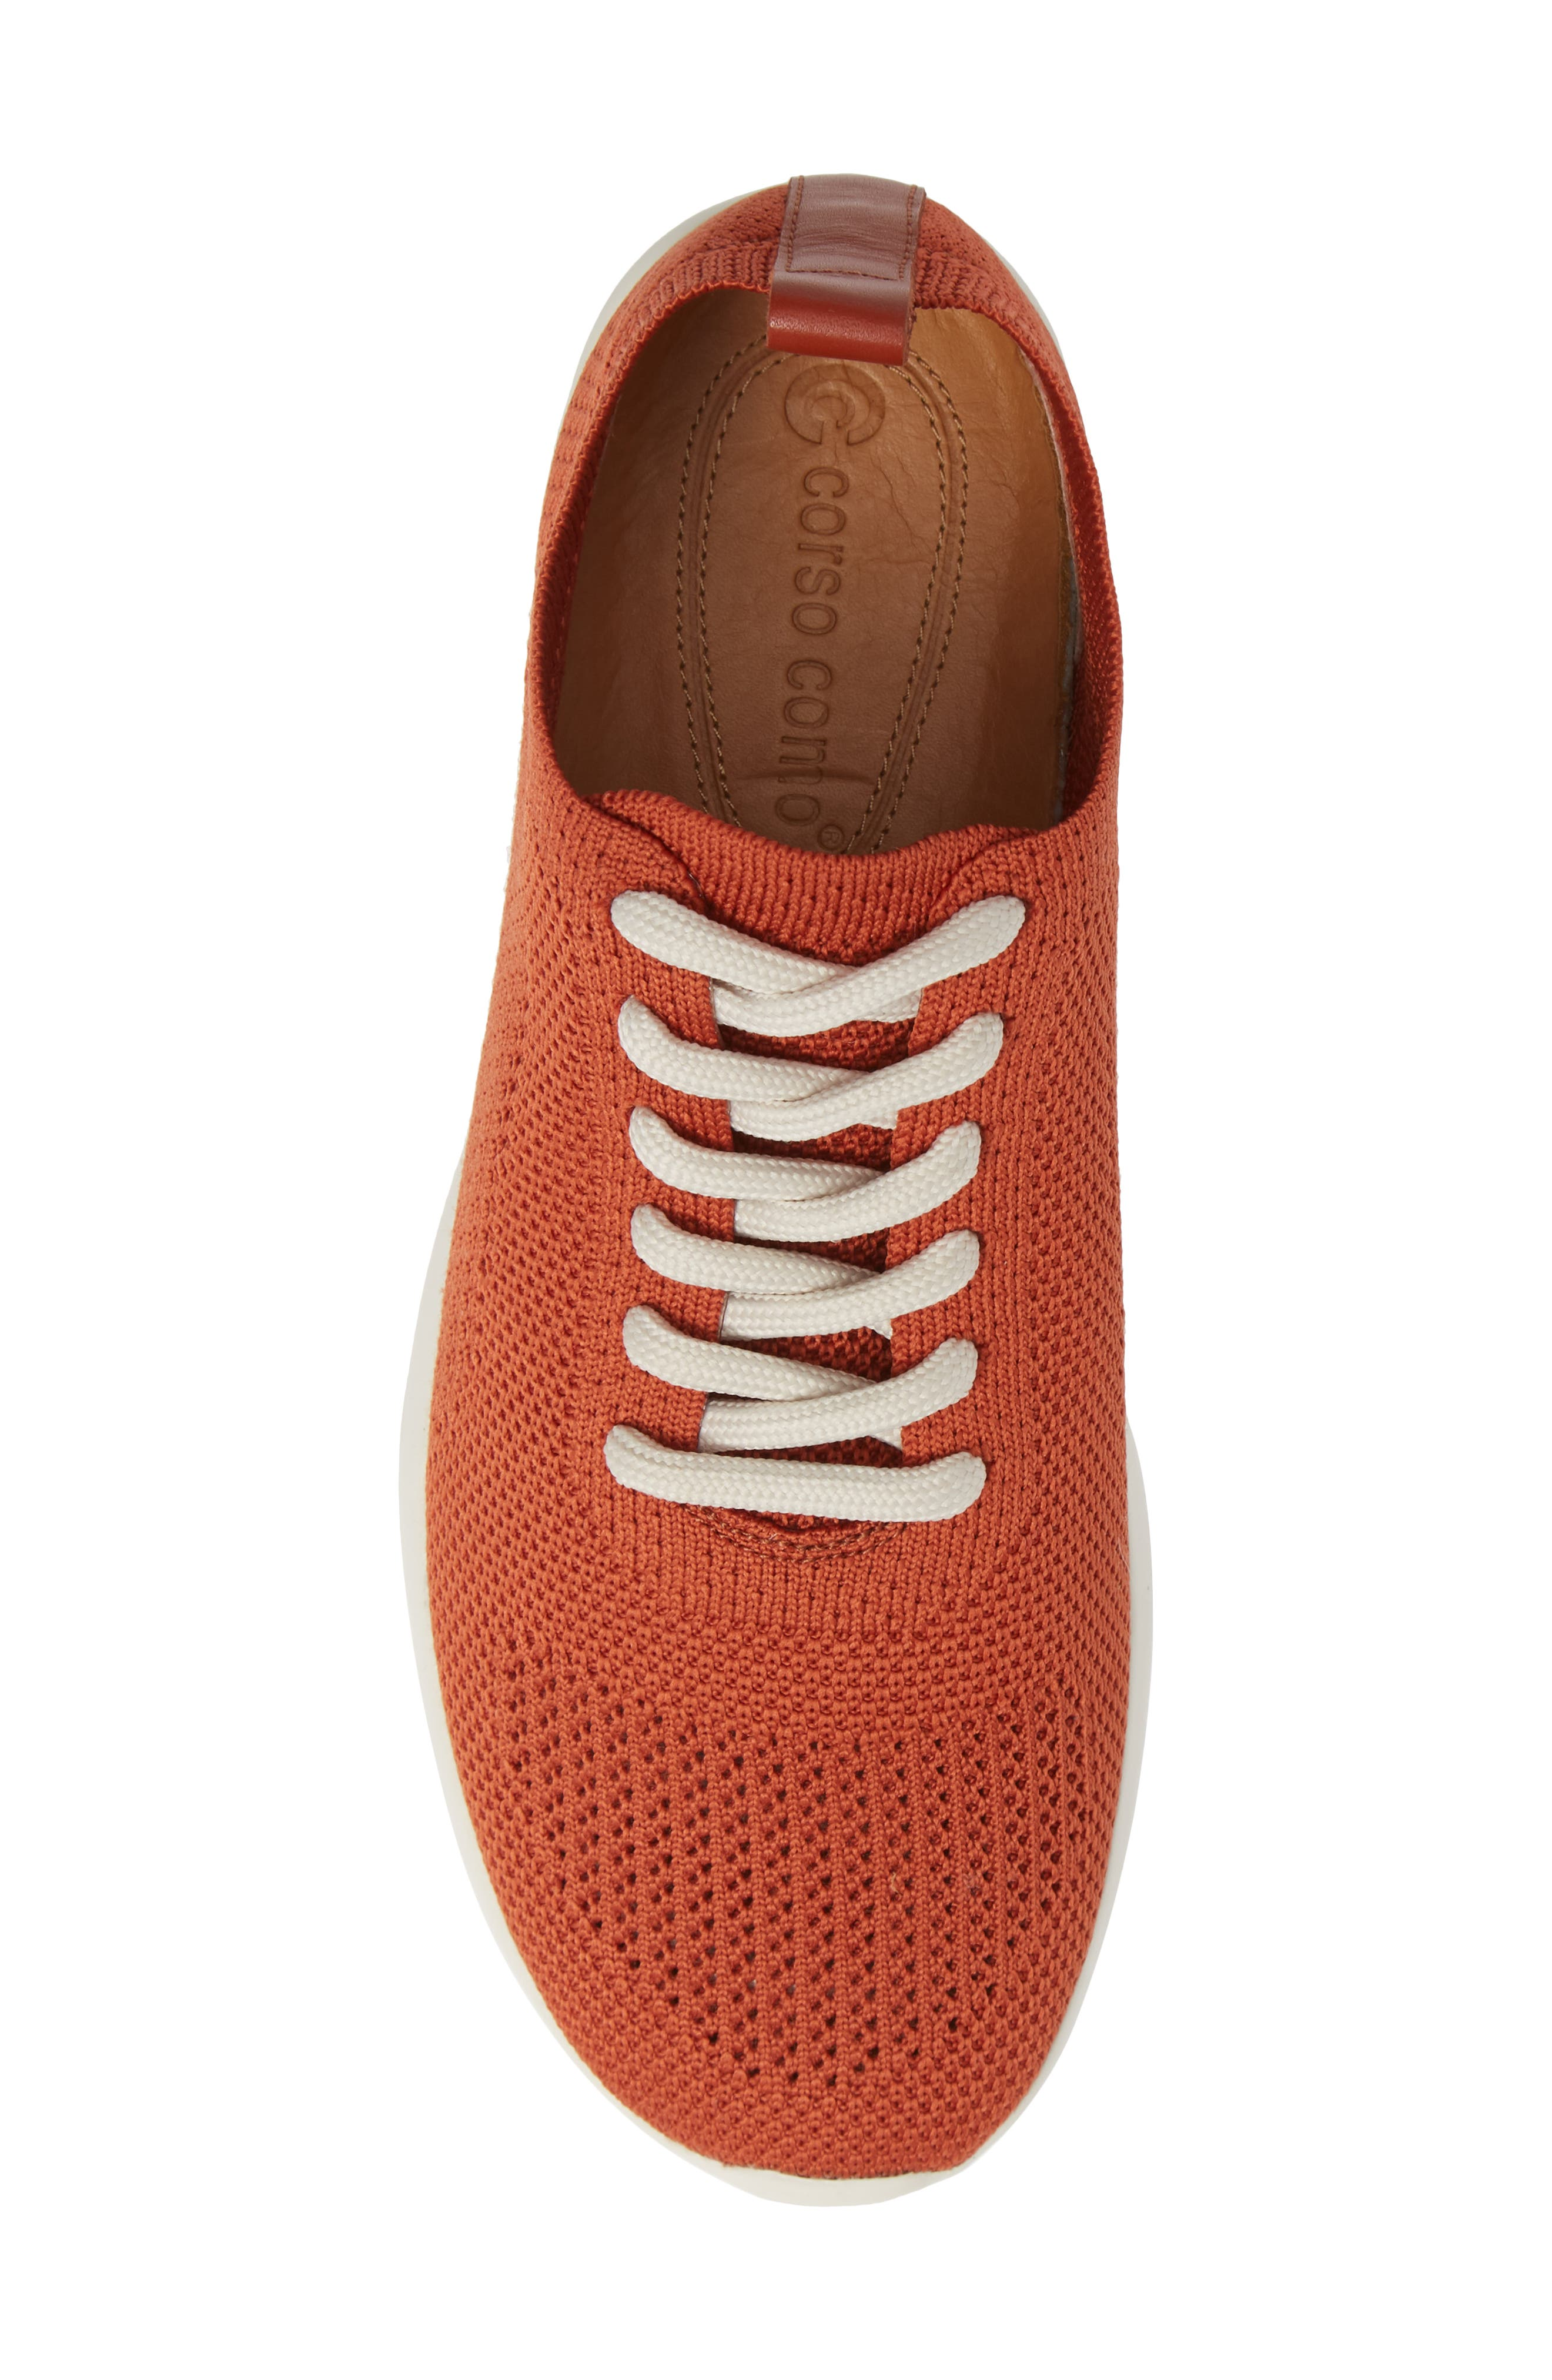 Randee Sneaker,                             Alternate thumbnail 24, color,